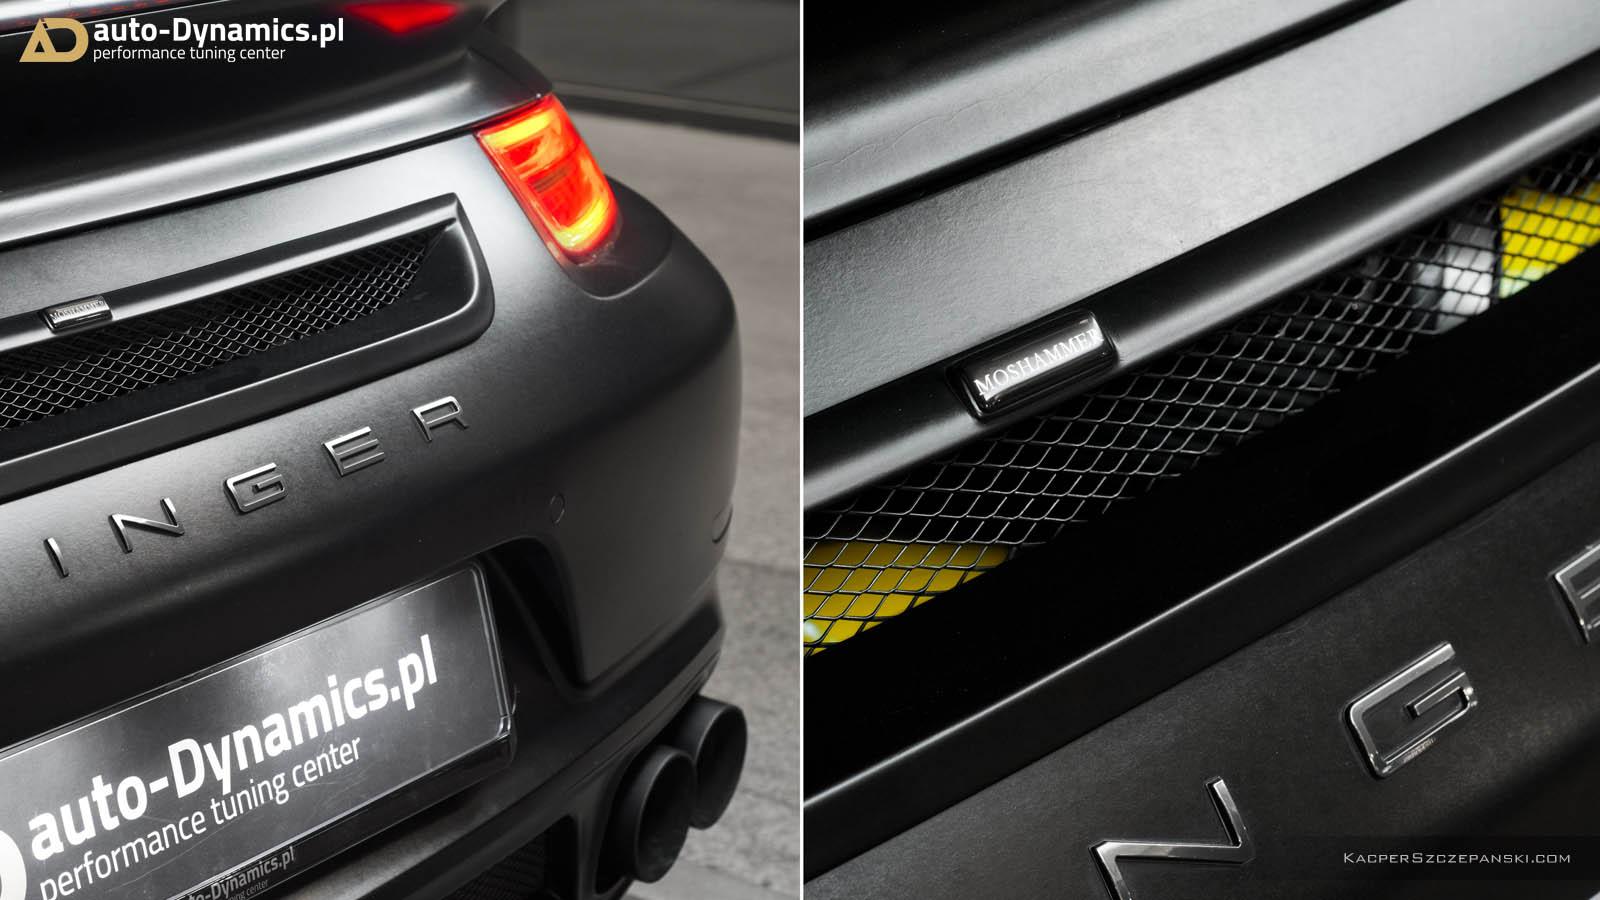 Porsche 911 Turbo S by Auto-Dynamics (11)